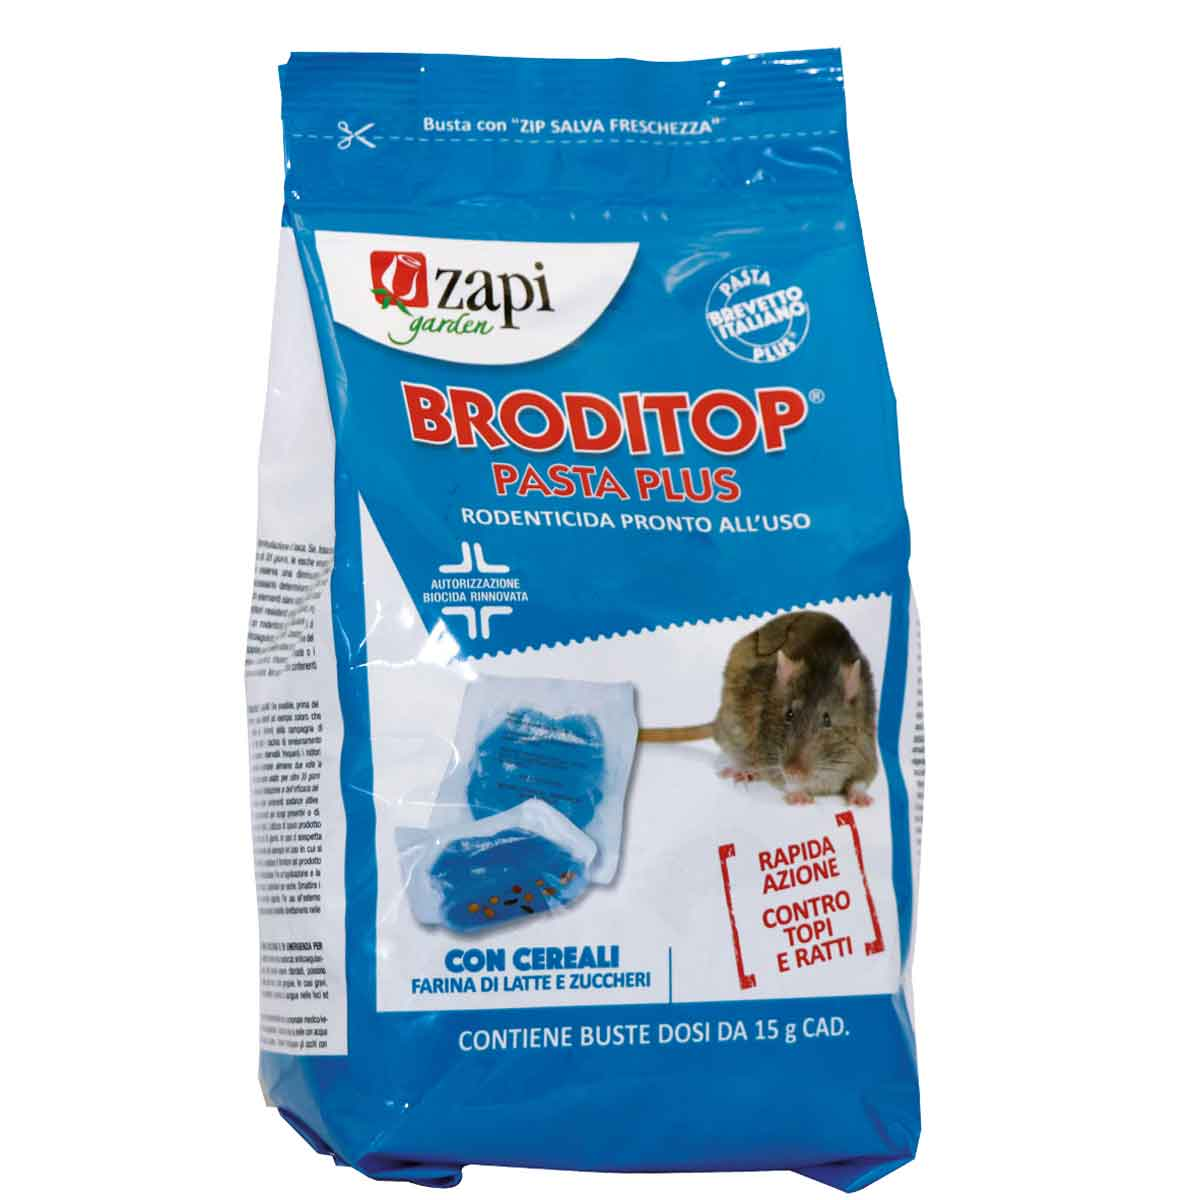 Zapi Topicida Broditop Pasta Plus 1,53kg